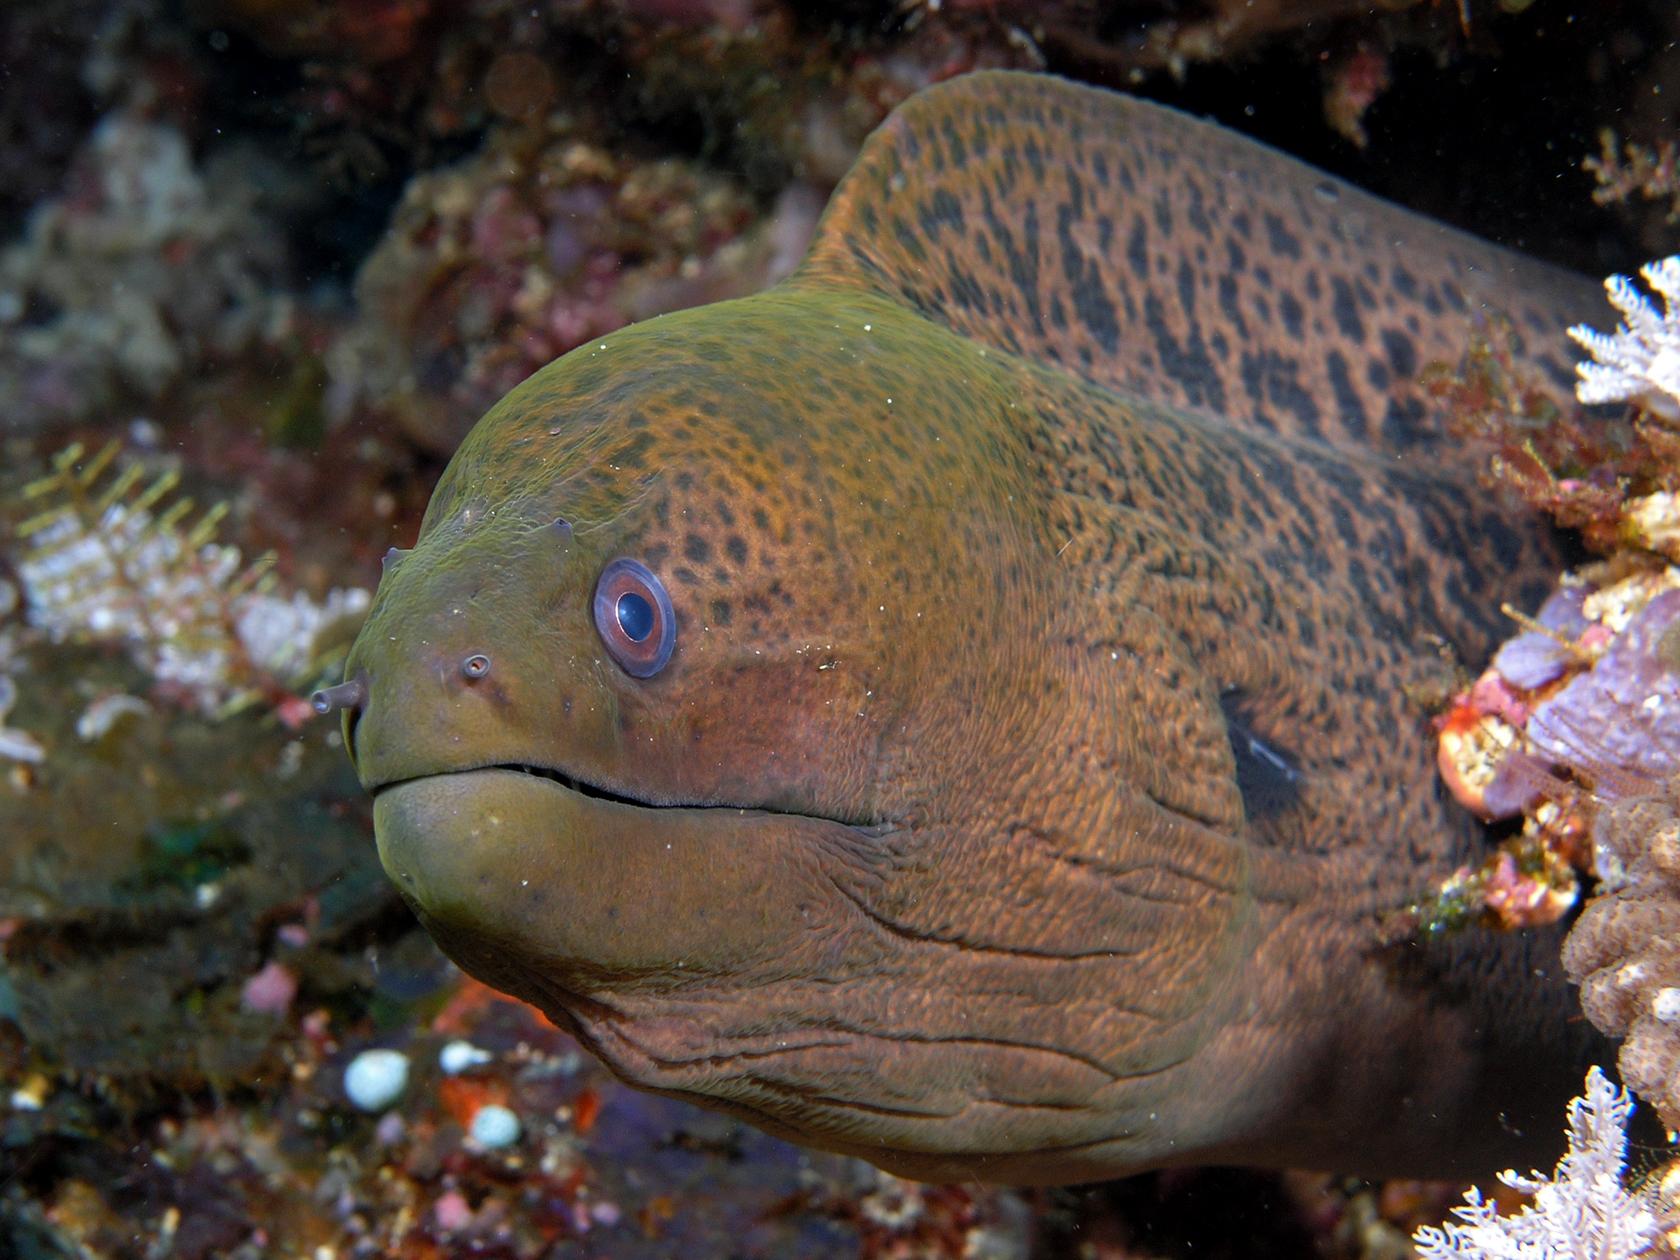 Moray eel swims wallpaper